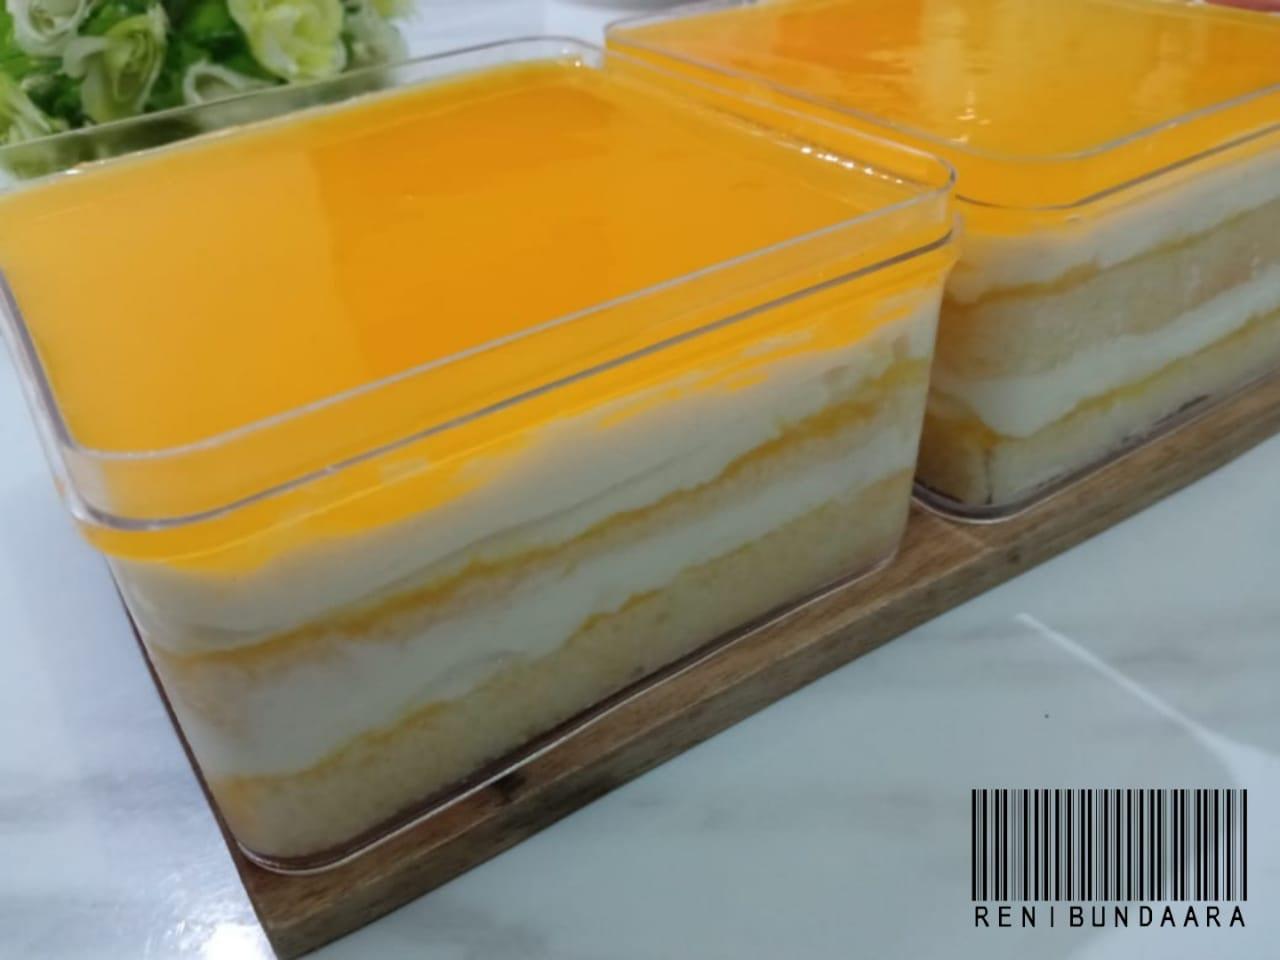 mewah Orange Custard Dessert by Reni Dwi Arti Agustina